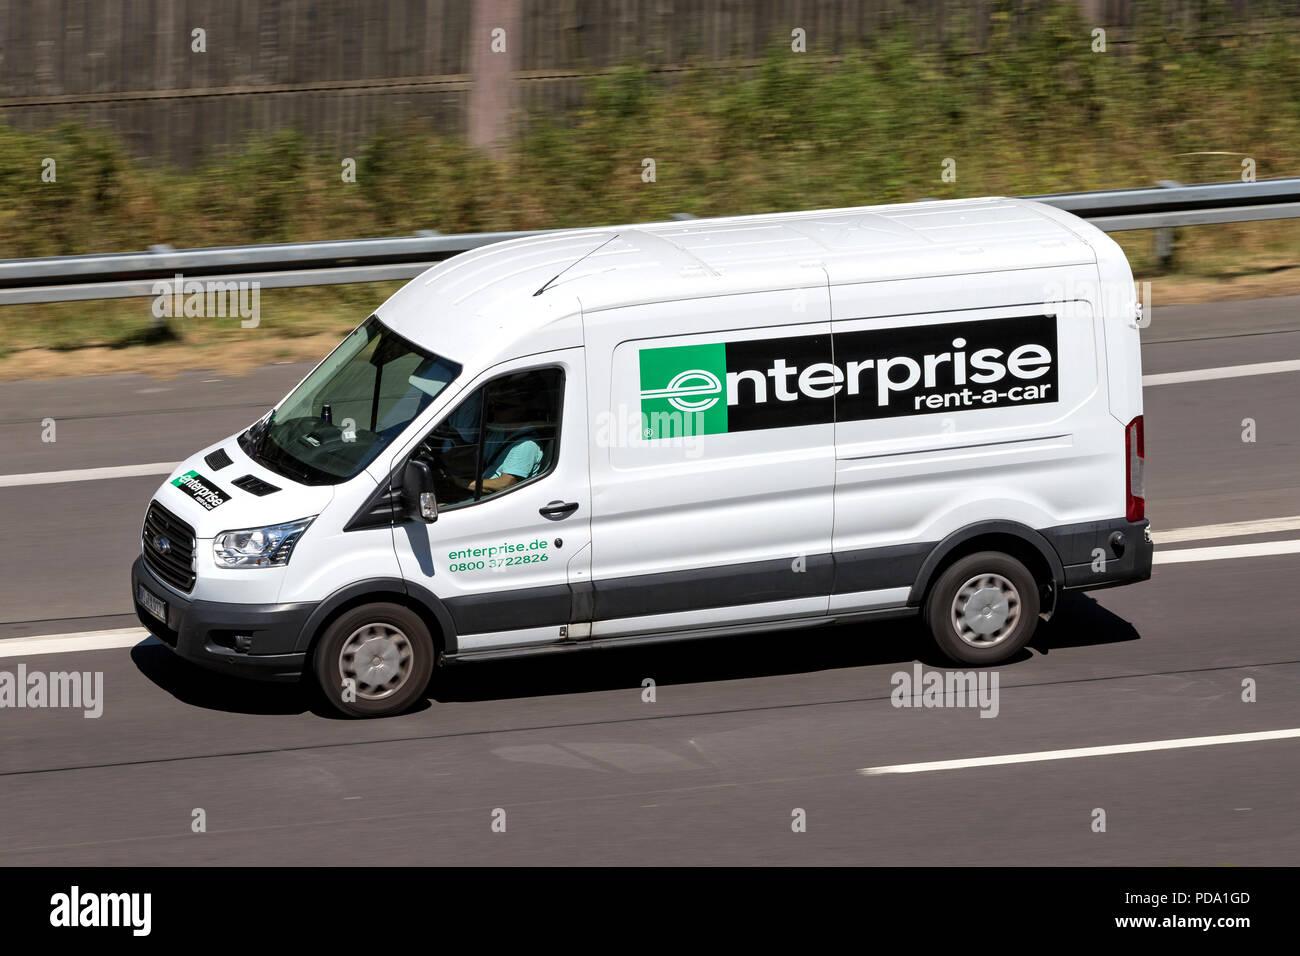 7d9ed9925e Ford Transit of Enterprise on motorway. Enterprise Rent-A-Car is an American